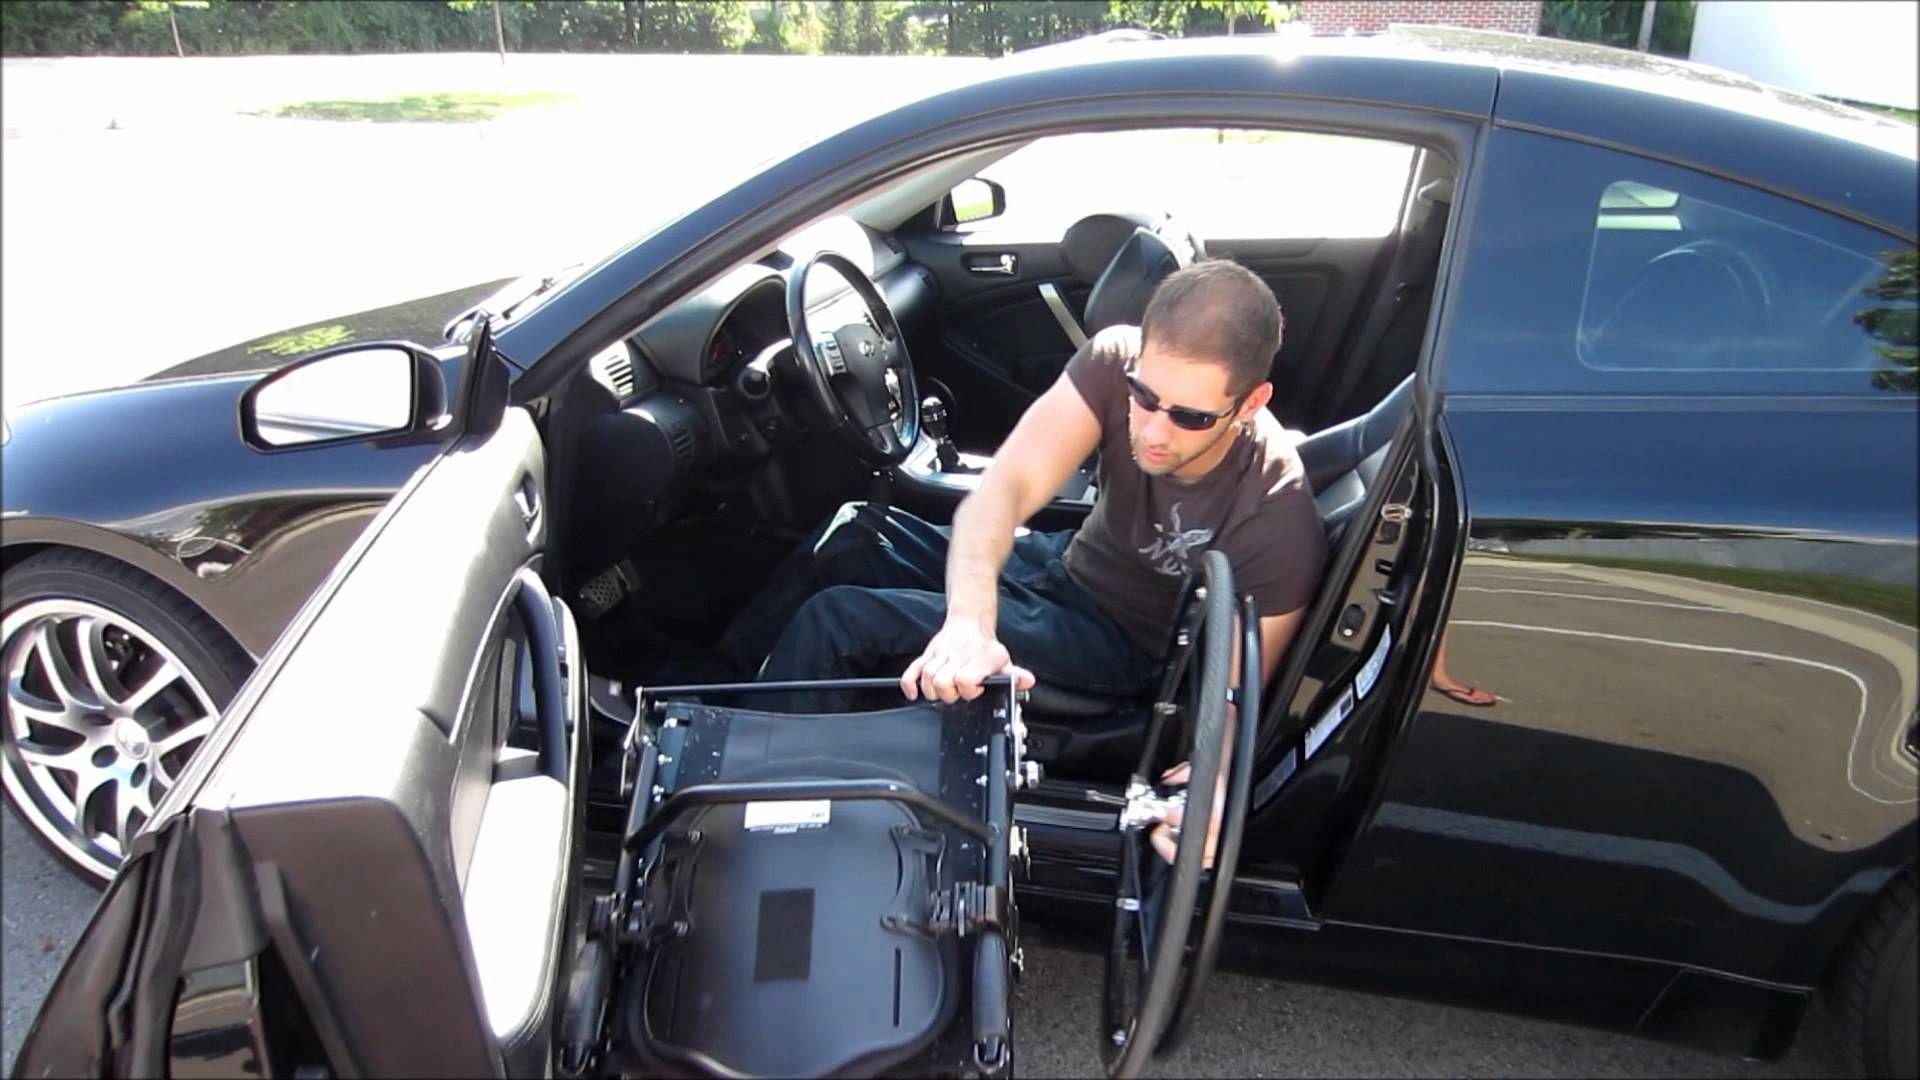 Paraplegic Car Transfer Spinal Cord Injury Paraplegic Spinal Cord Injury Awareness